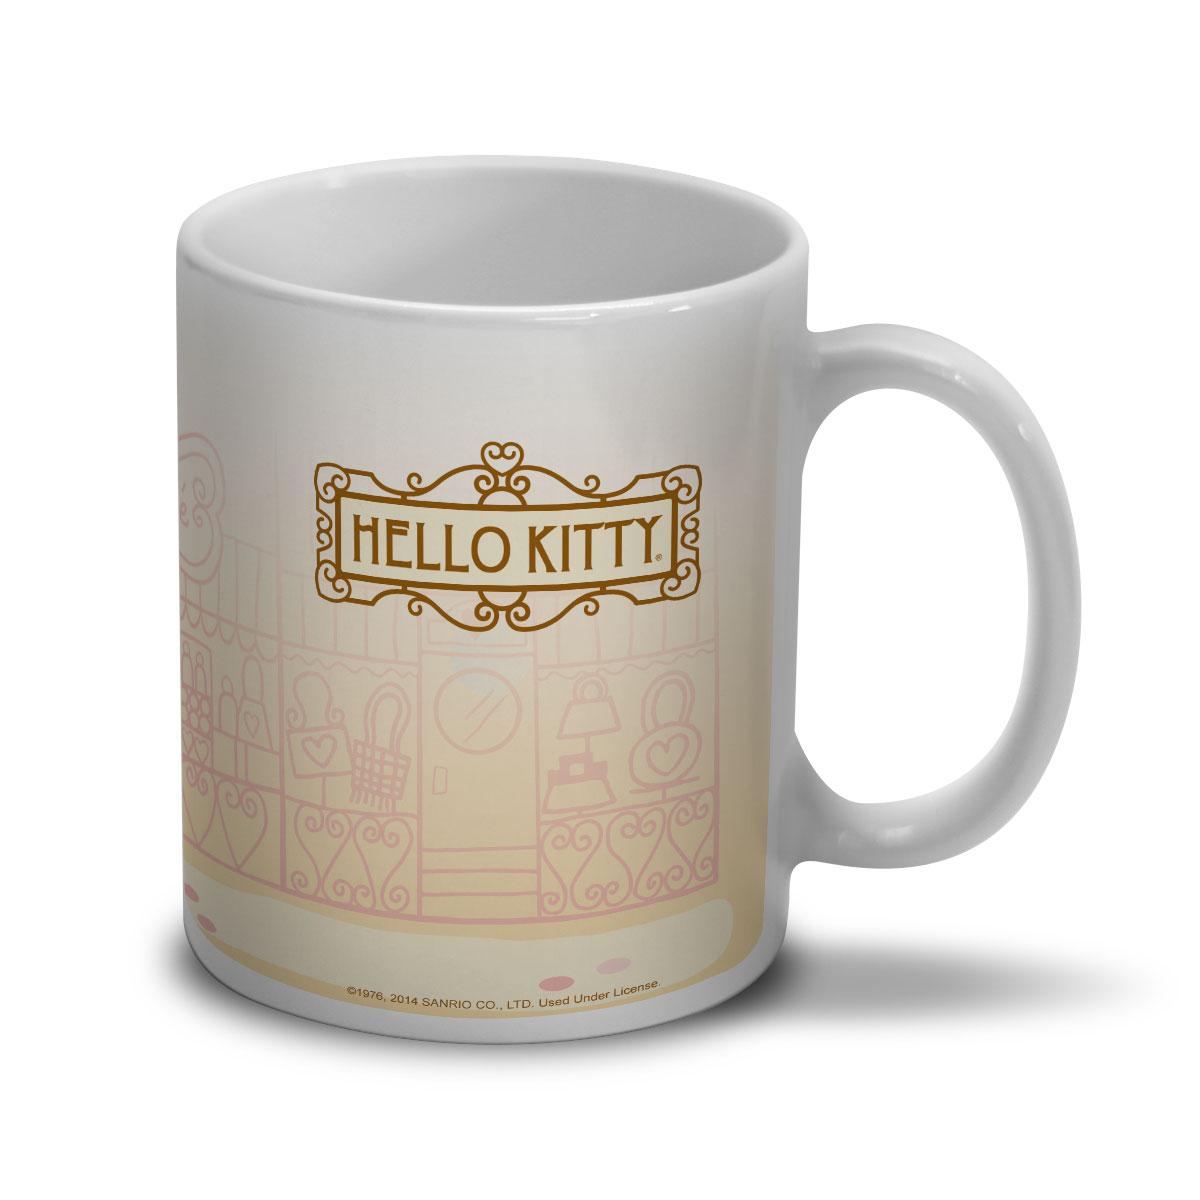 Caneca Hello Kitty Salut! Ça Va?